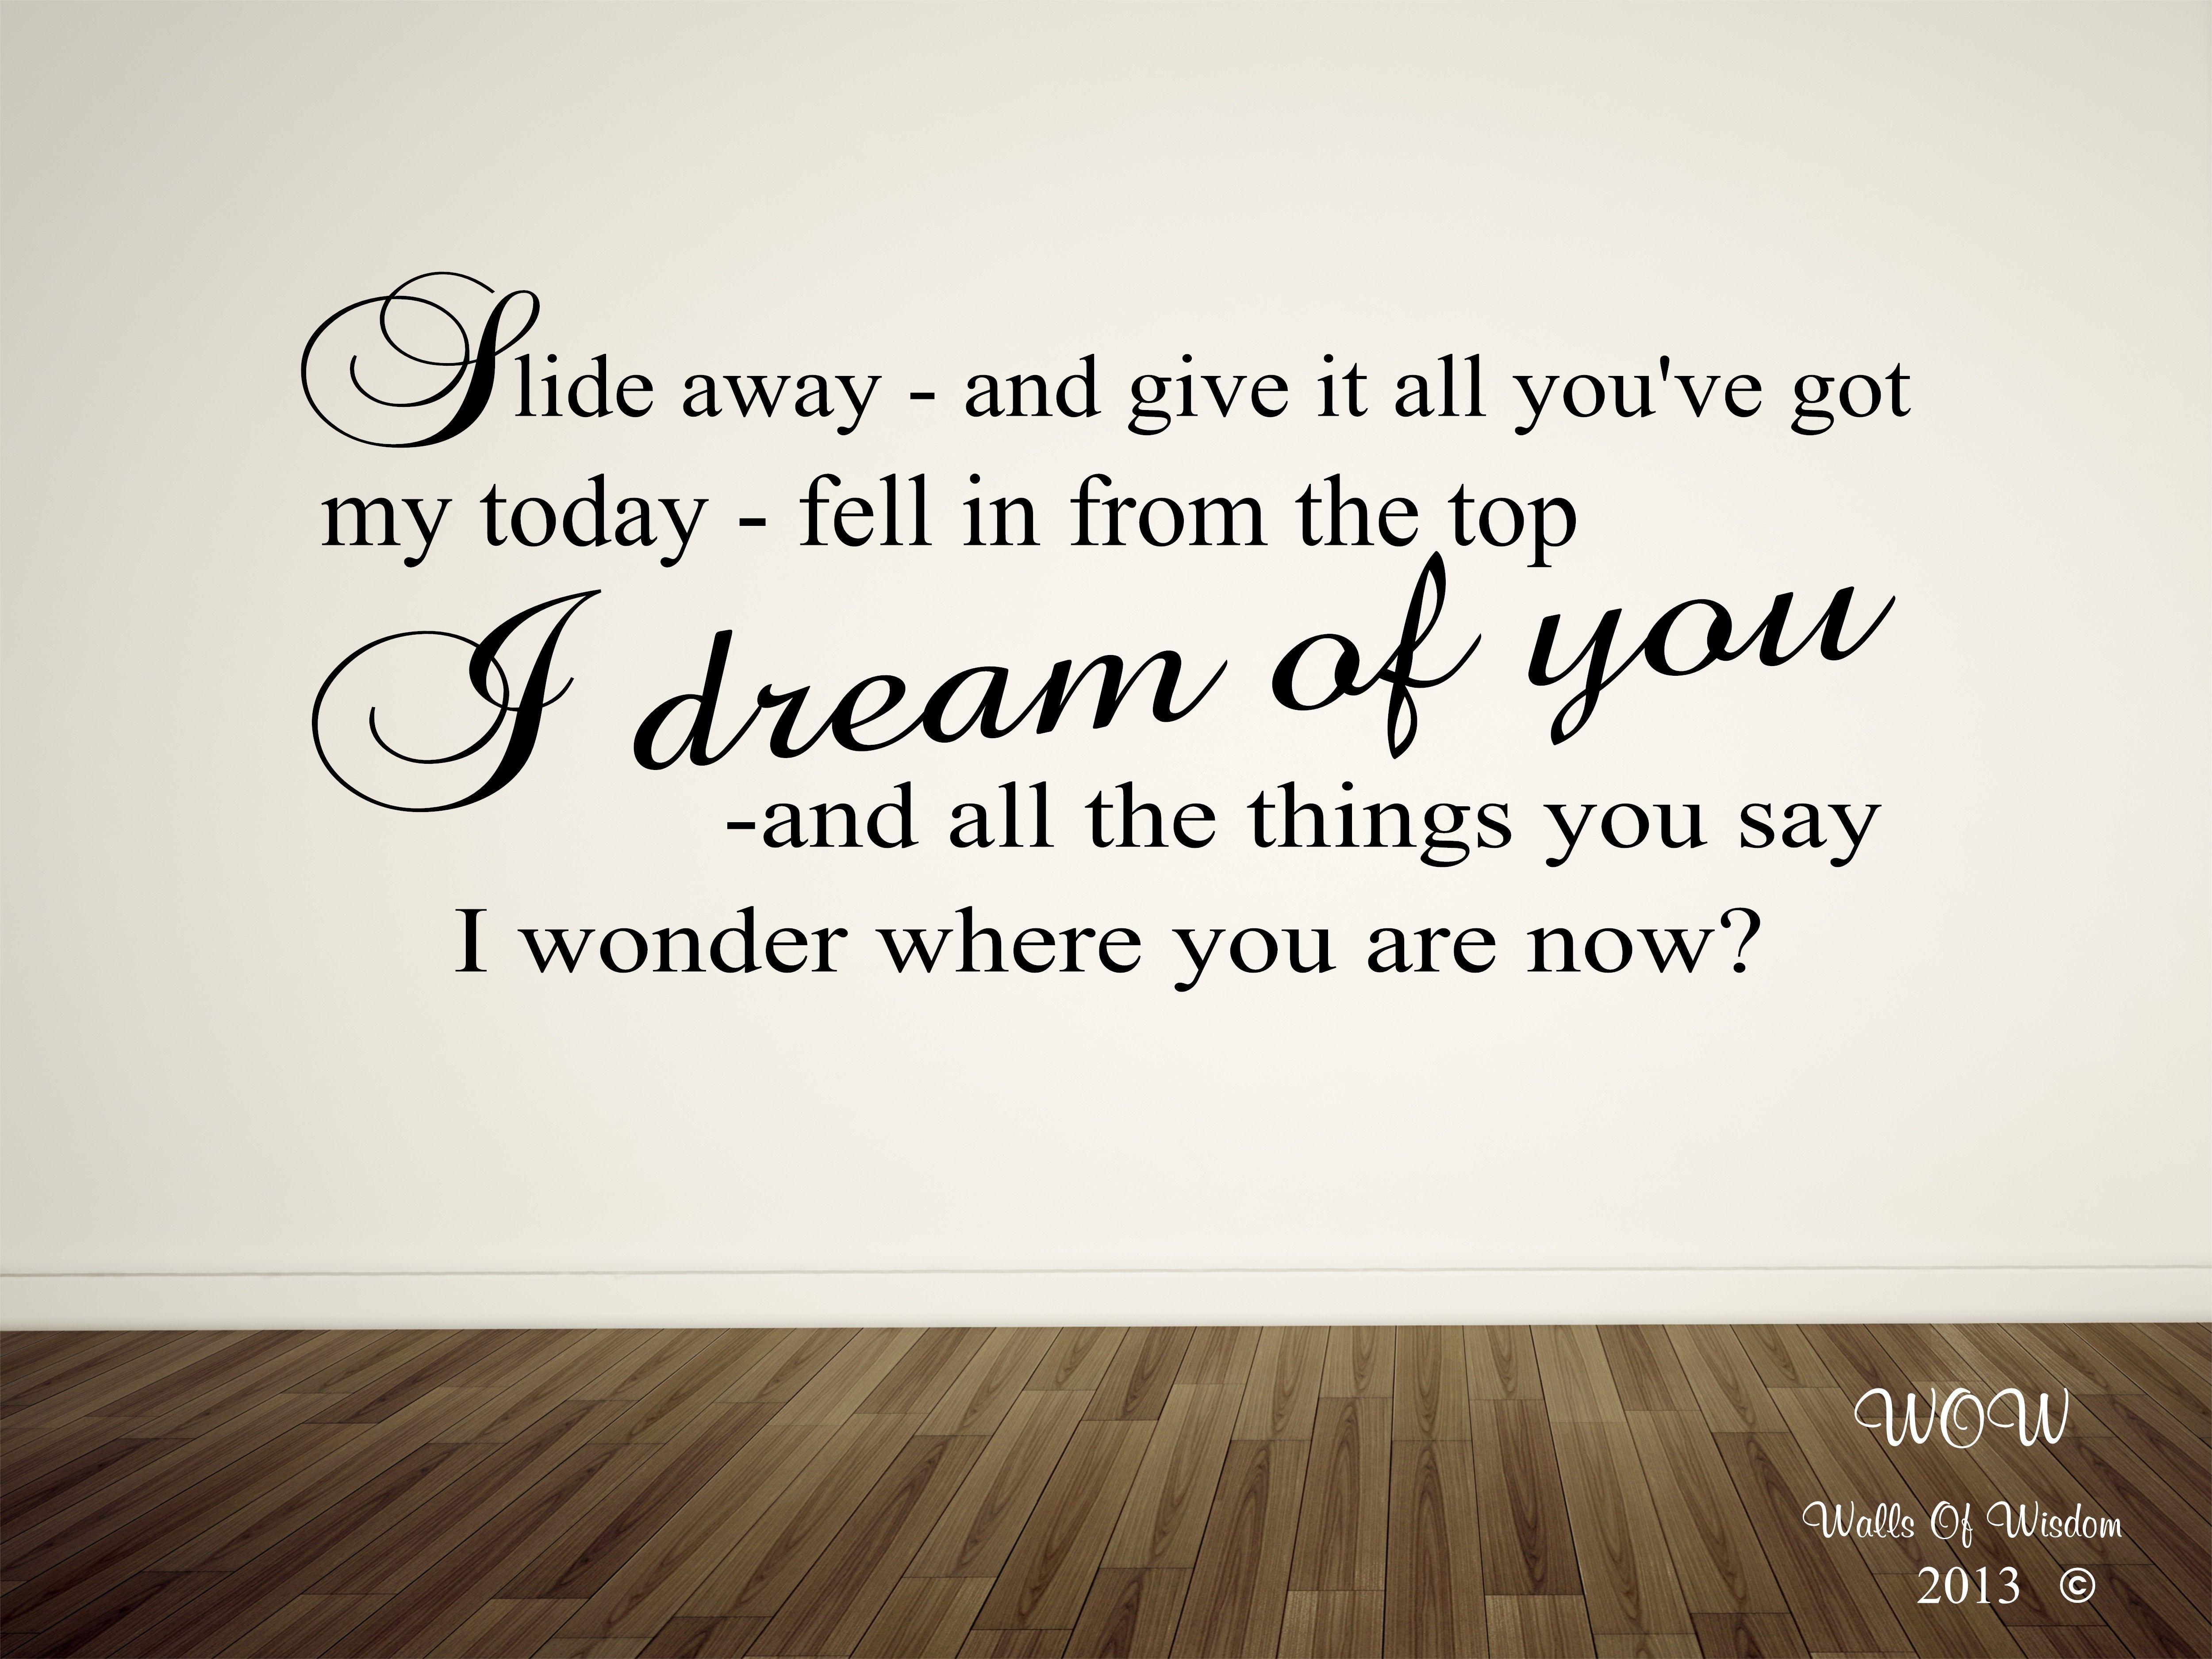 slide away lyrics - photo #39